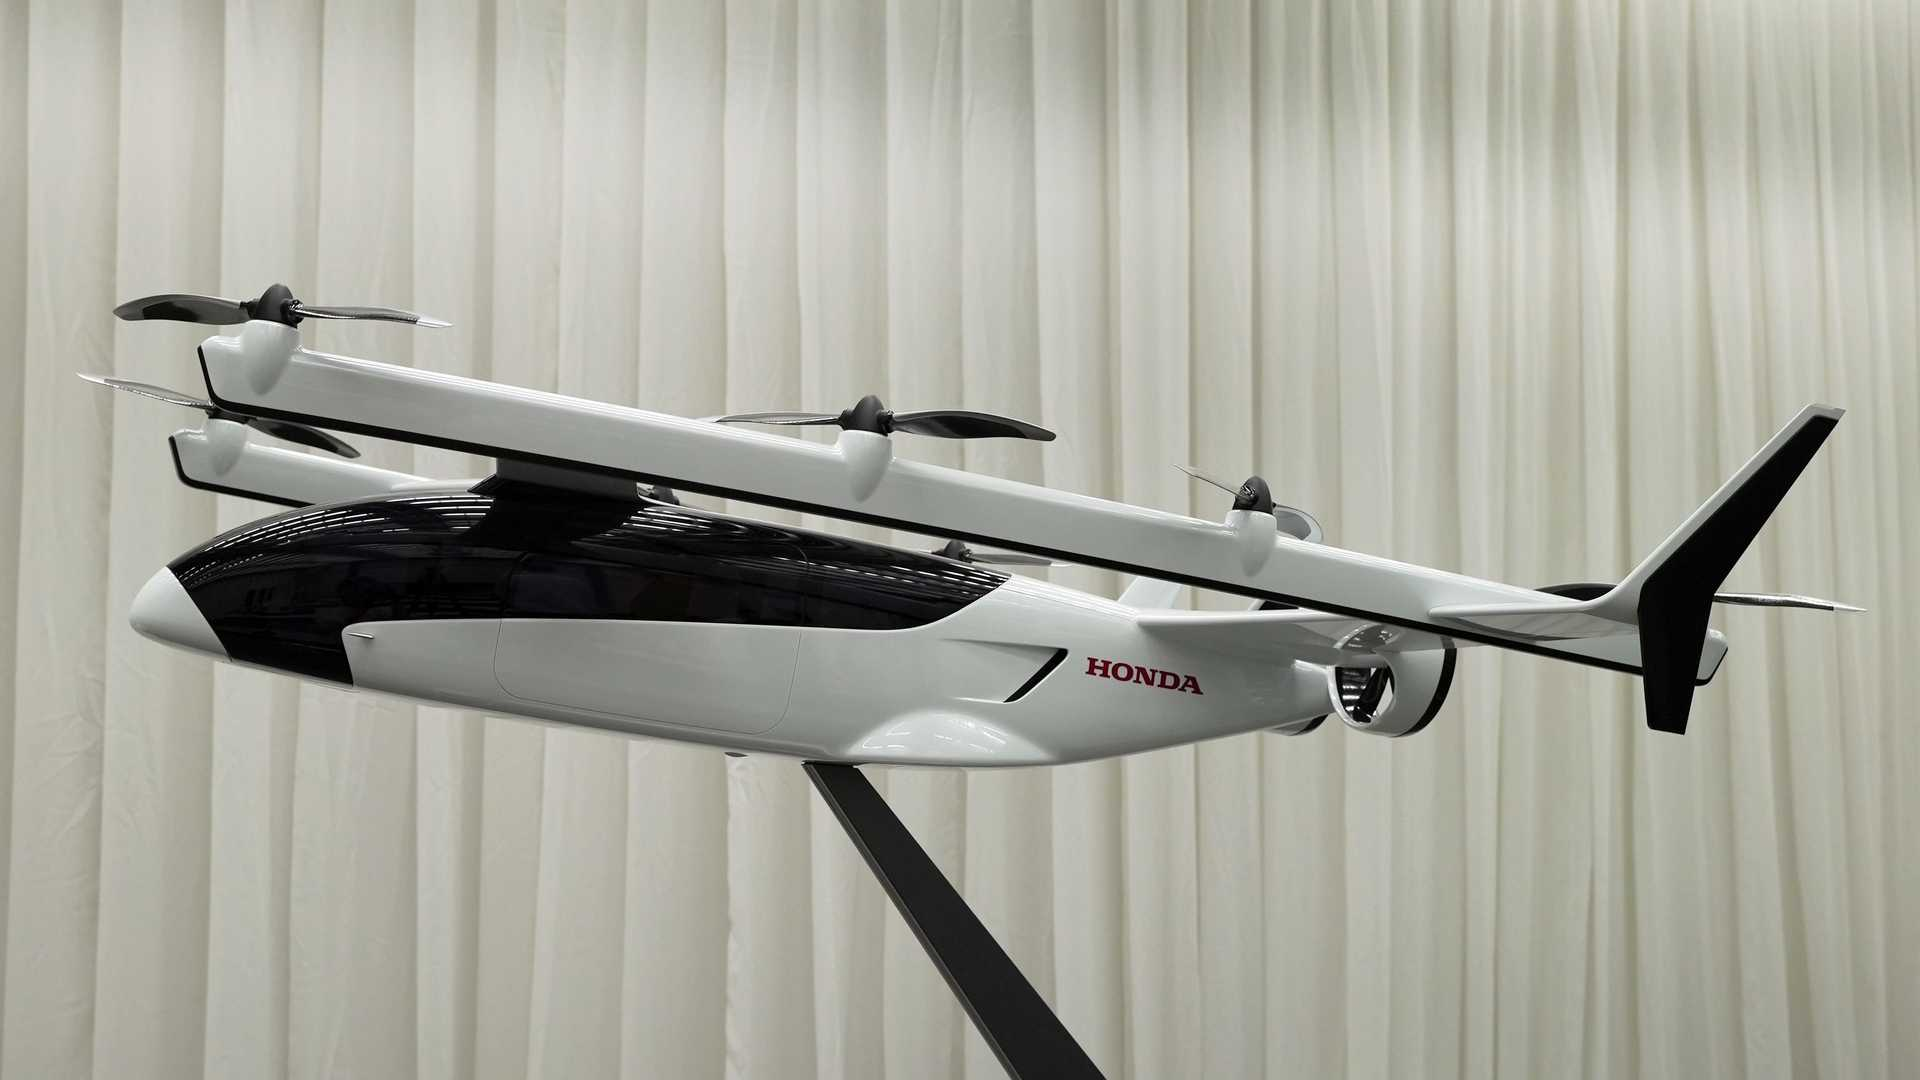 Honda-eVTOL-Hybrid-Mobility-Aircraft-2